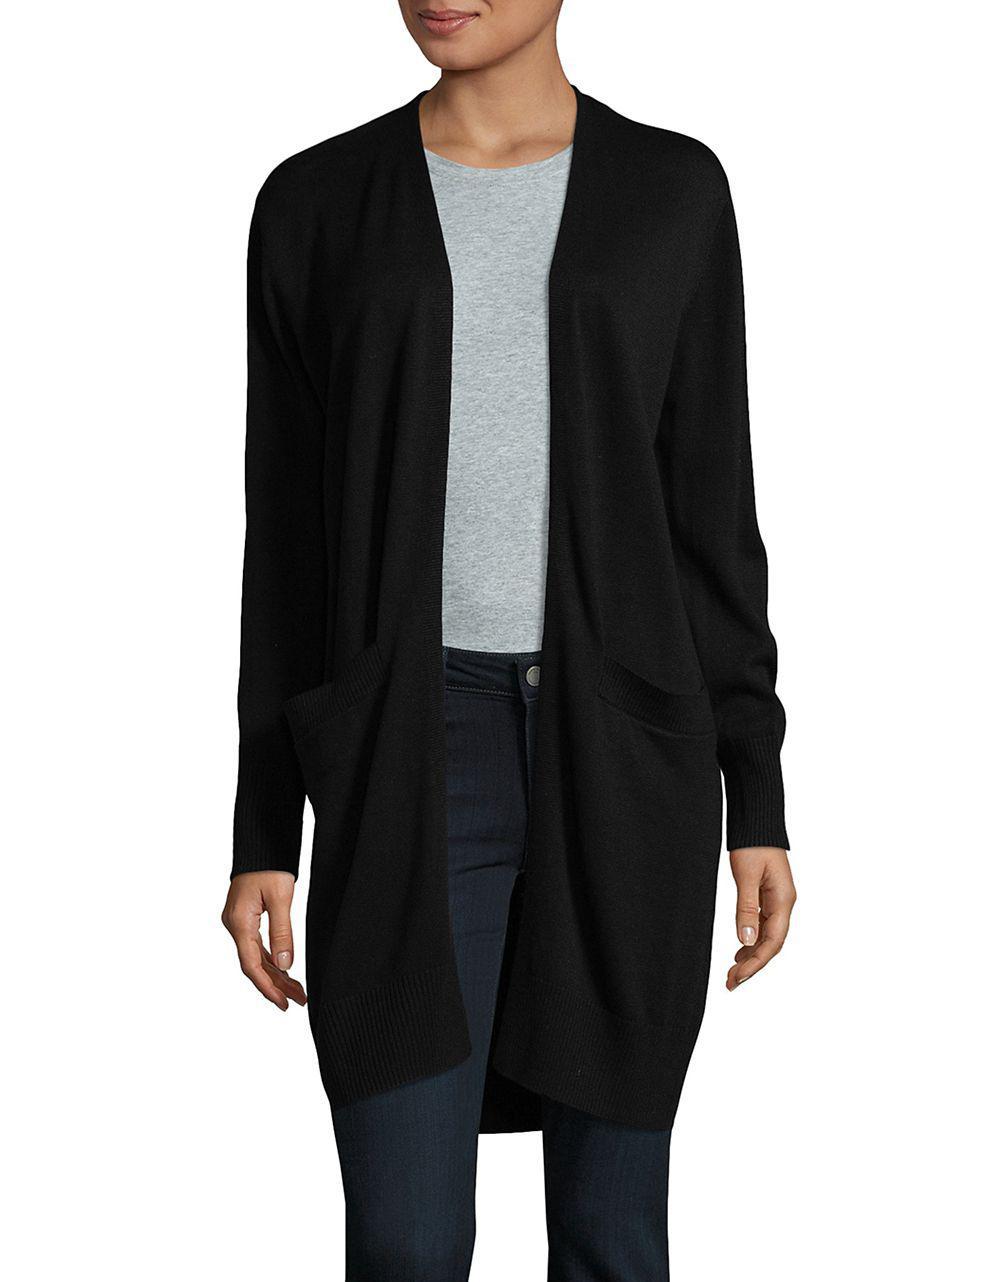 Donna karan Long Sleeve Open Front Cardigan in Black | Lyst